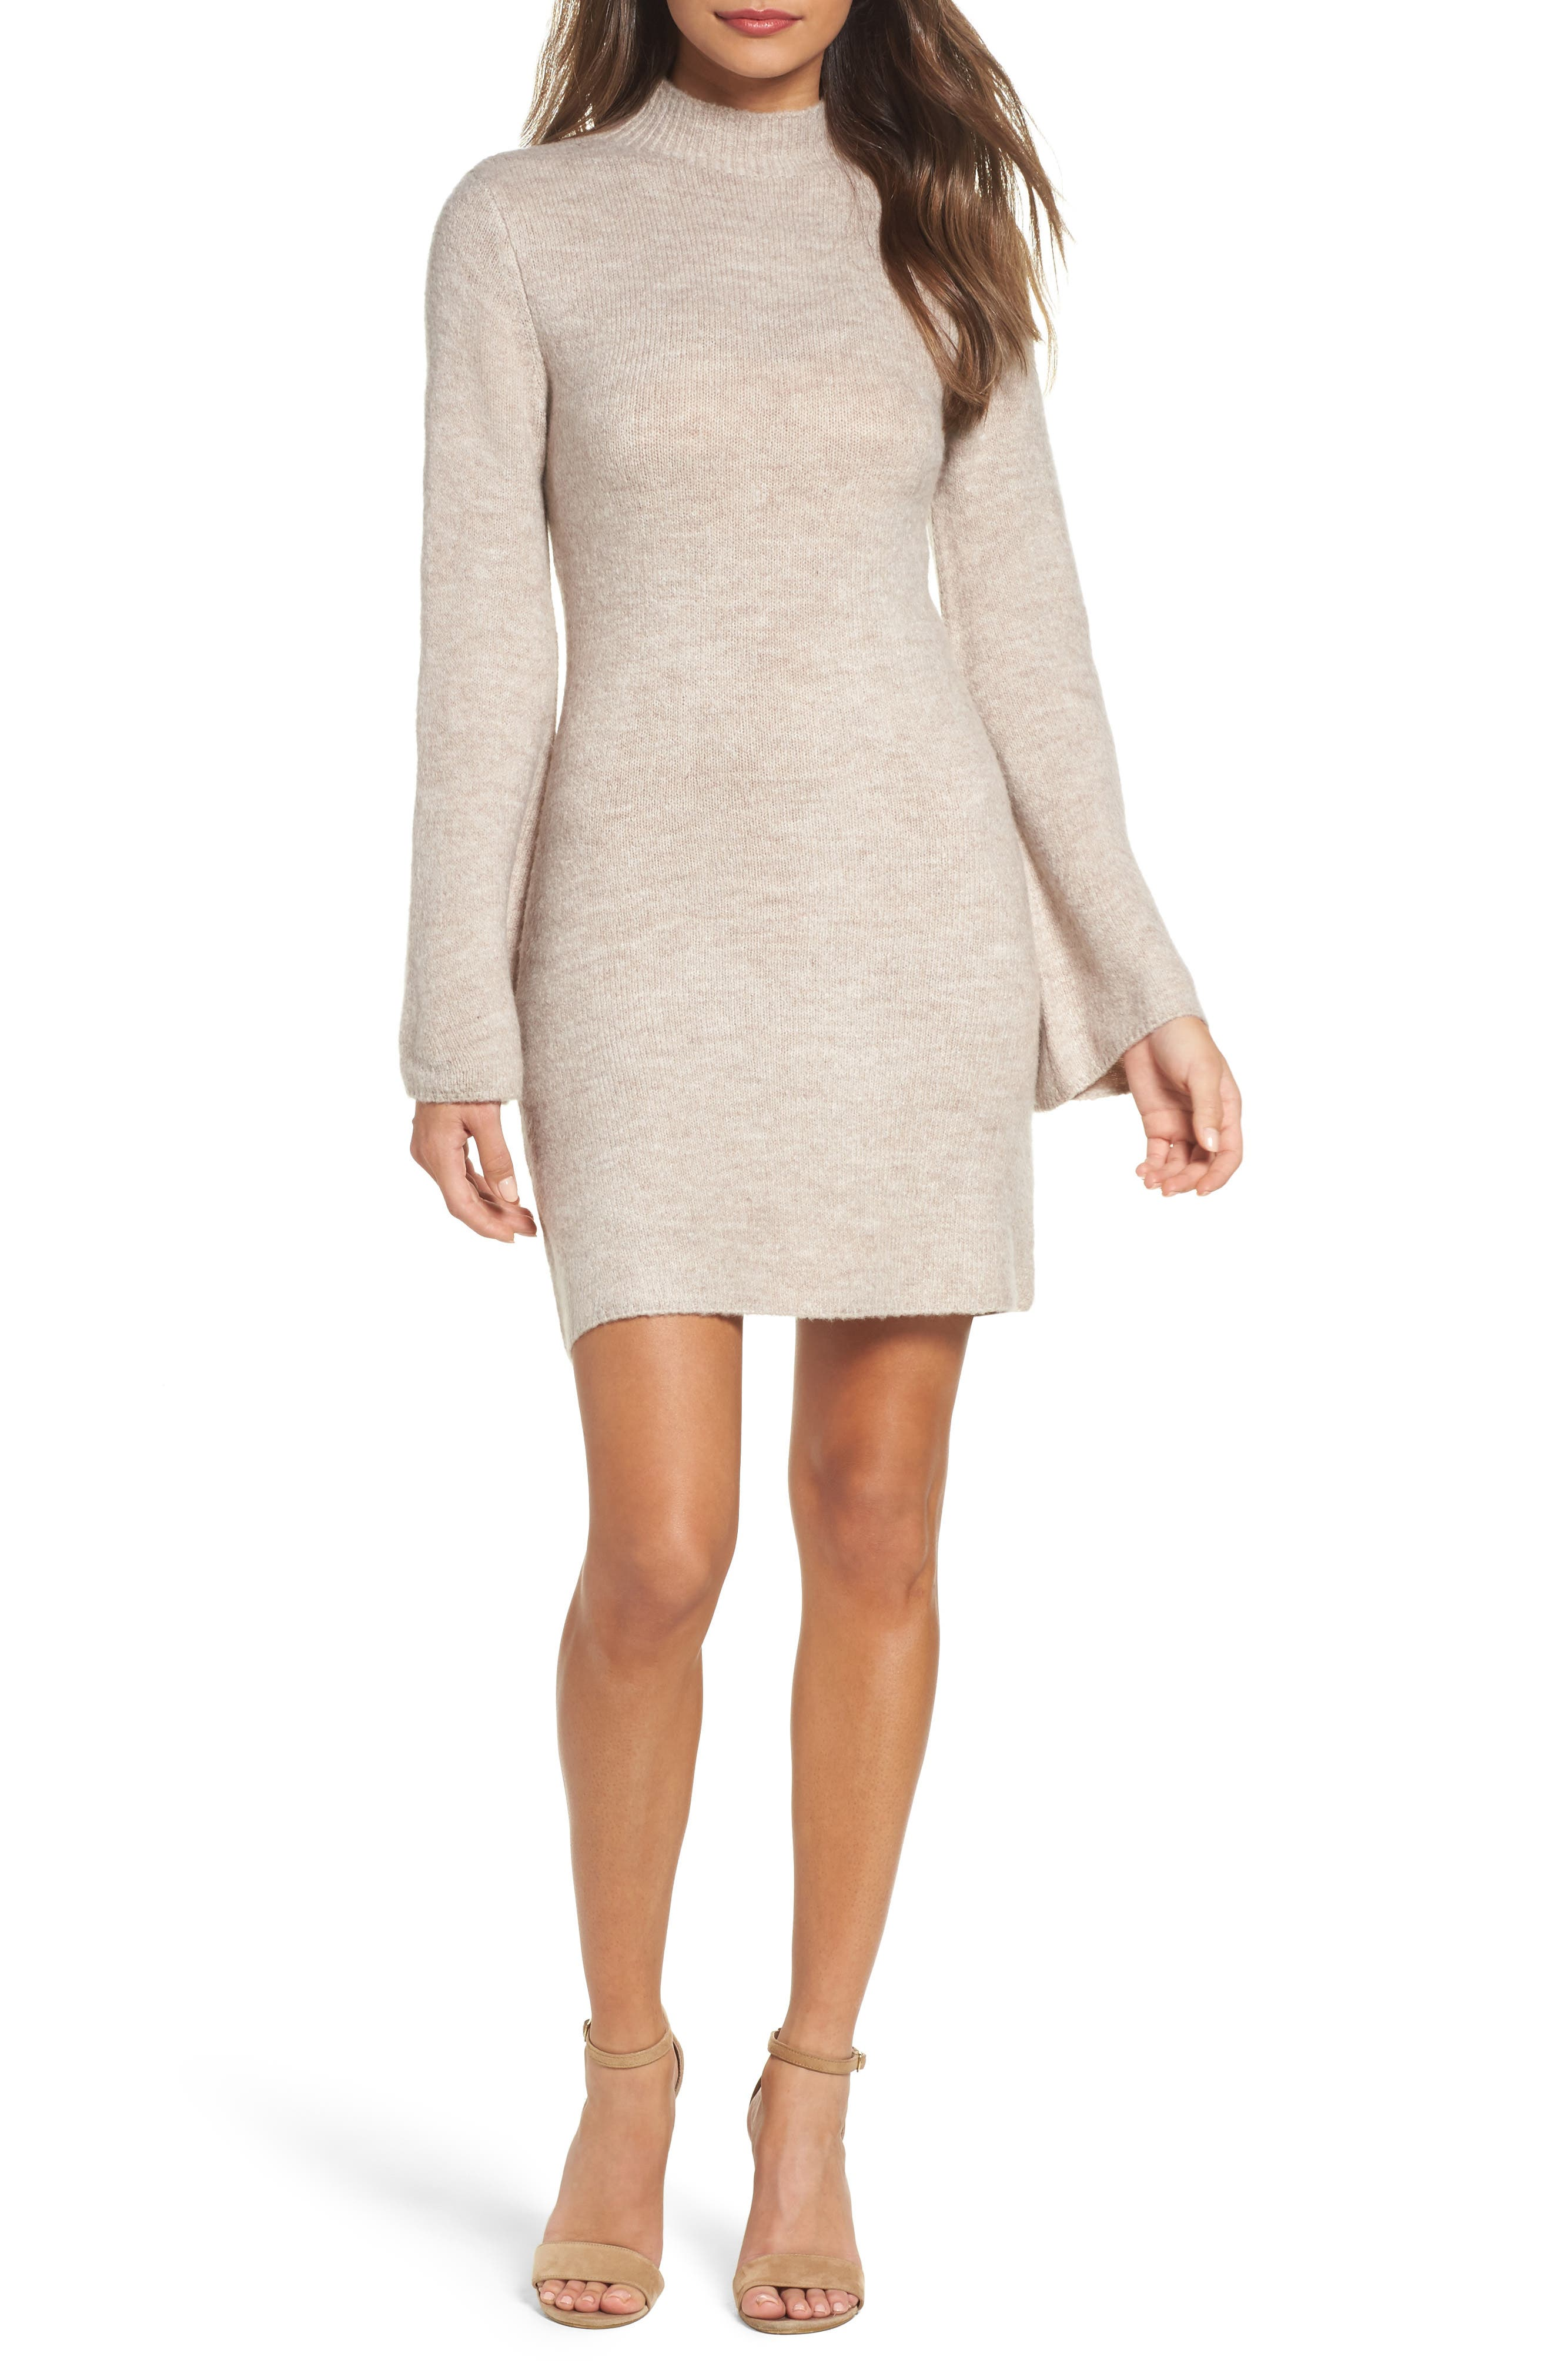 Main Image - Bardot Bell Sleeve Knit Dress